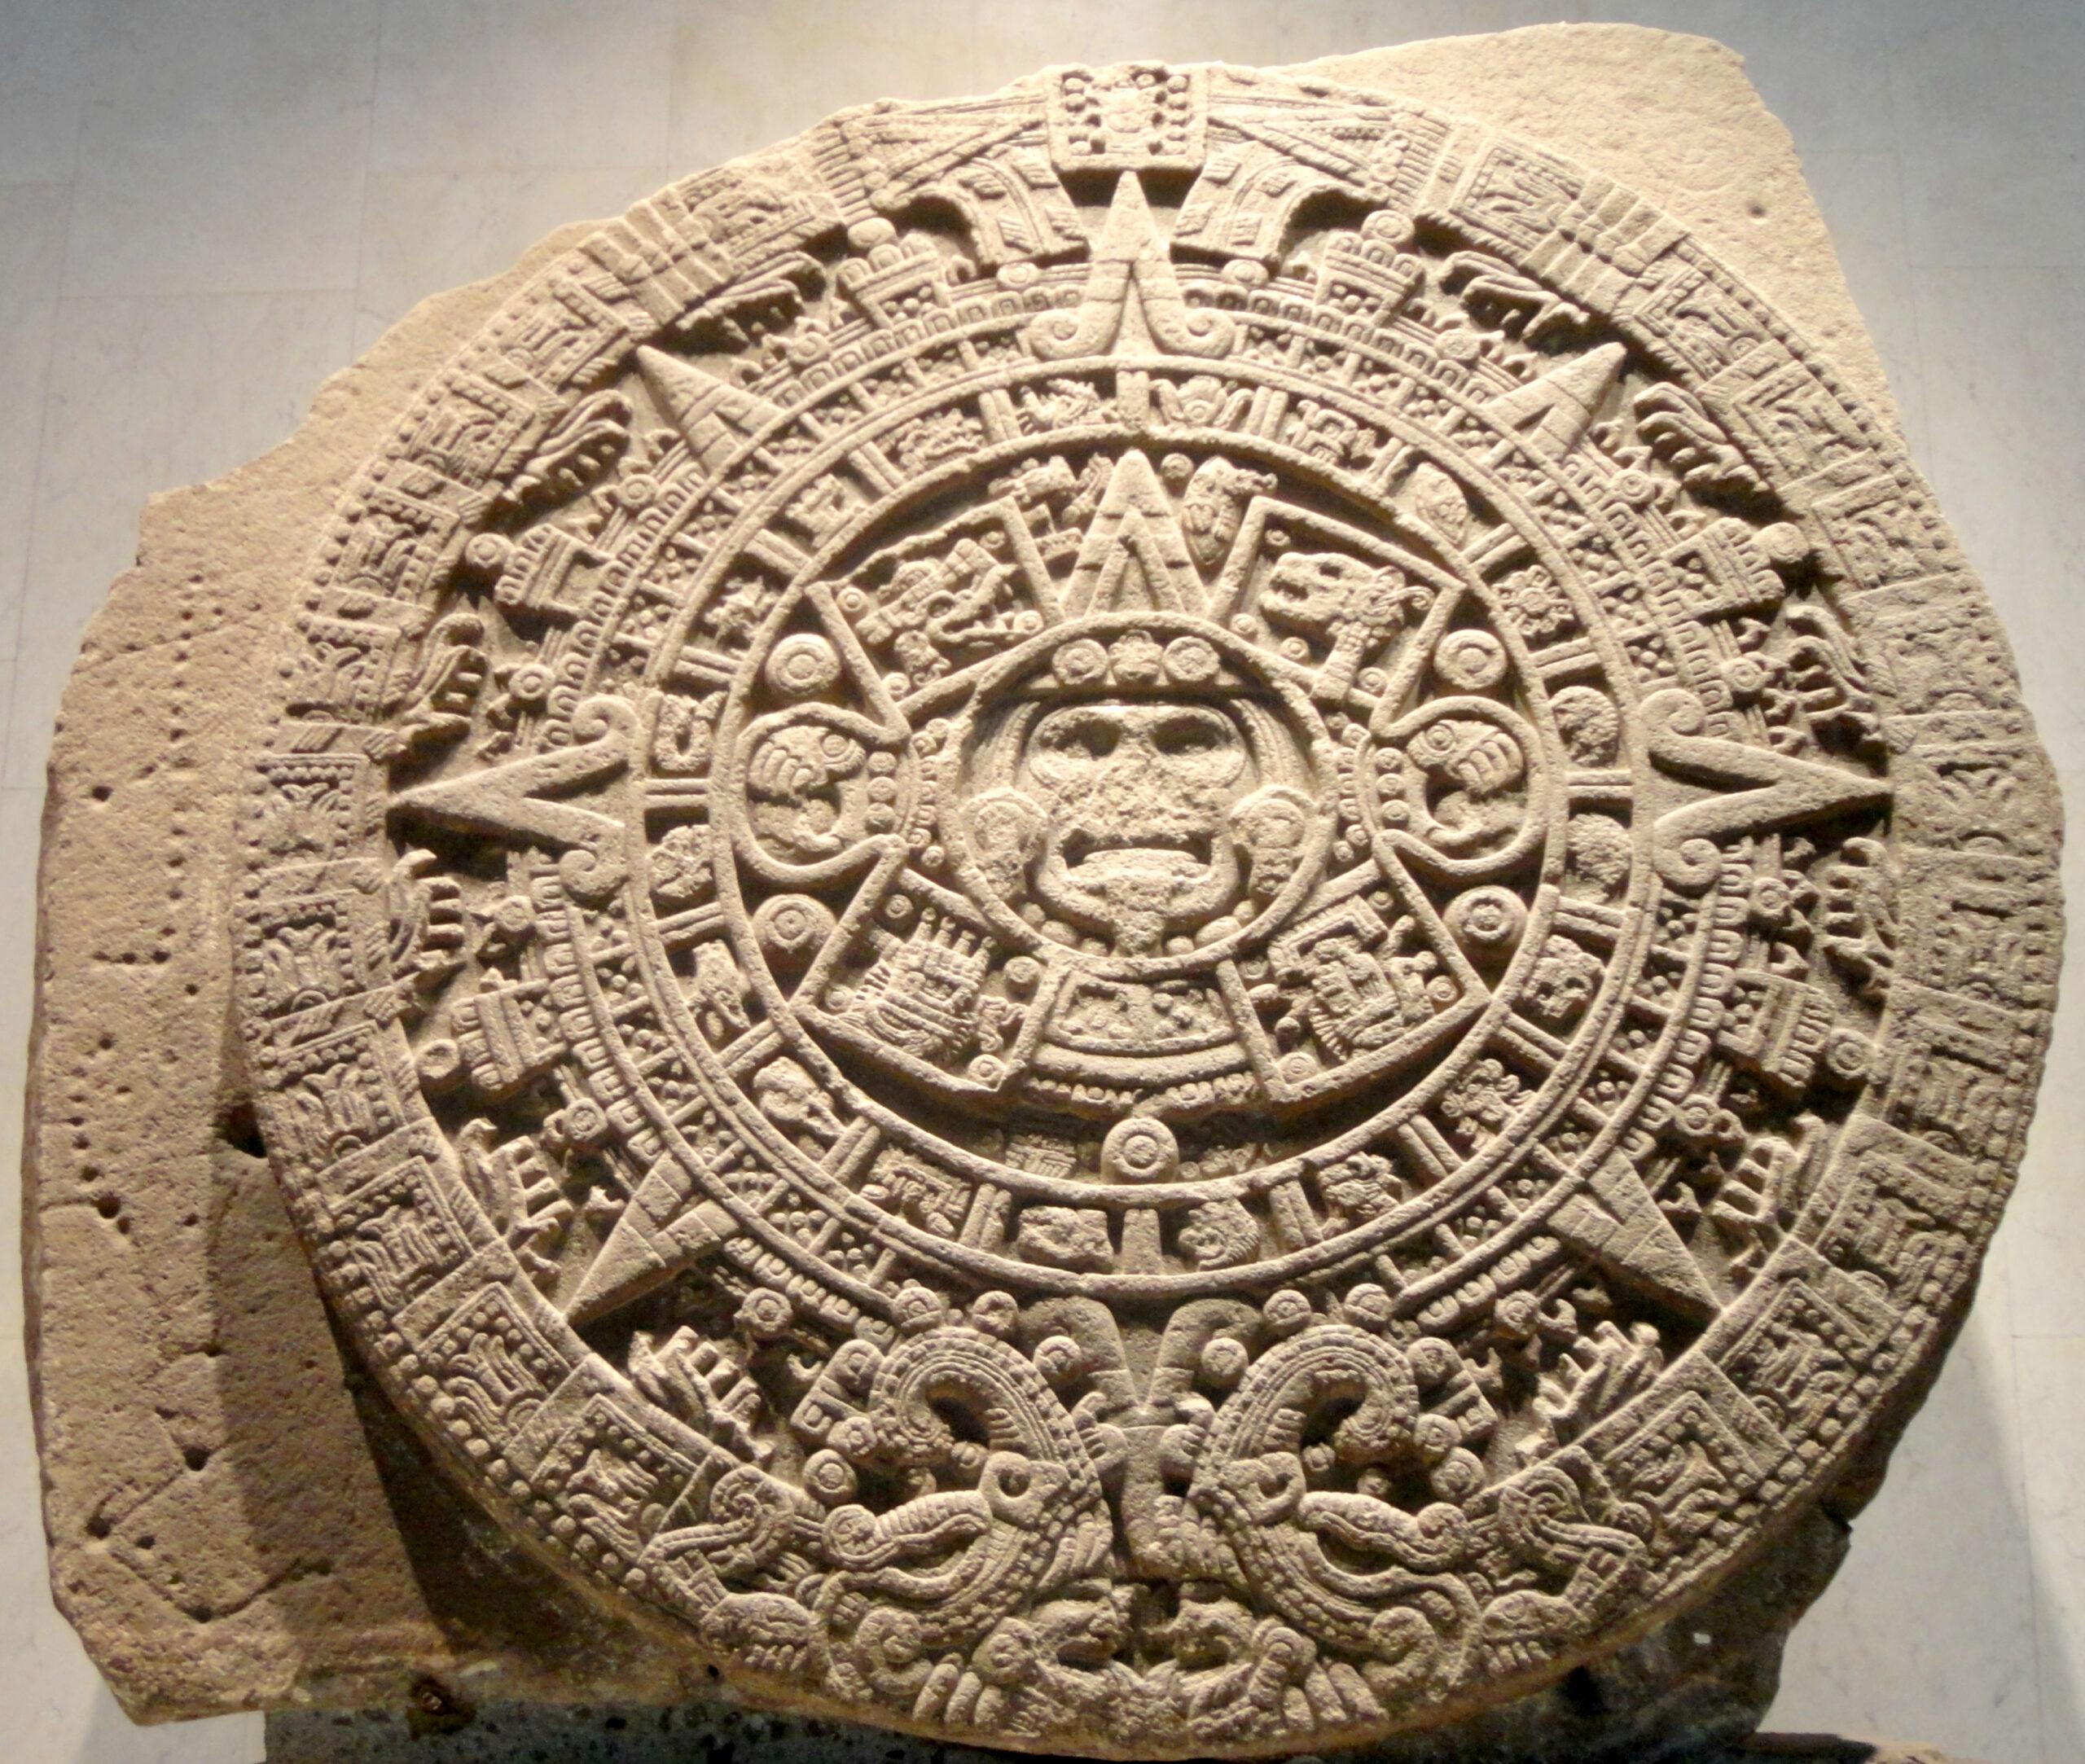 Aztec Sun Stone - Wikipedia